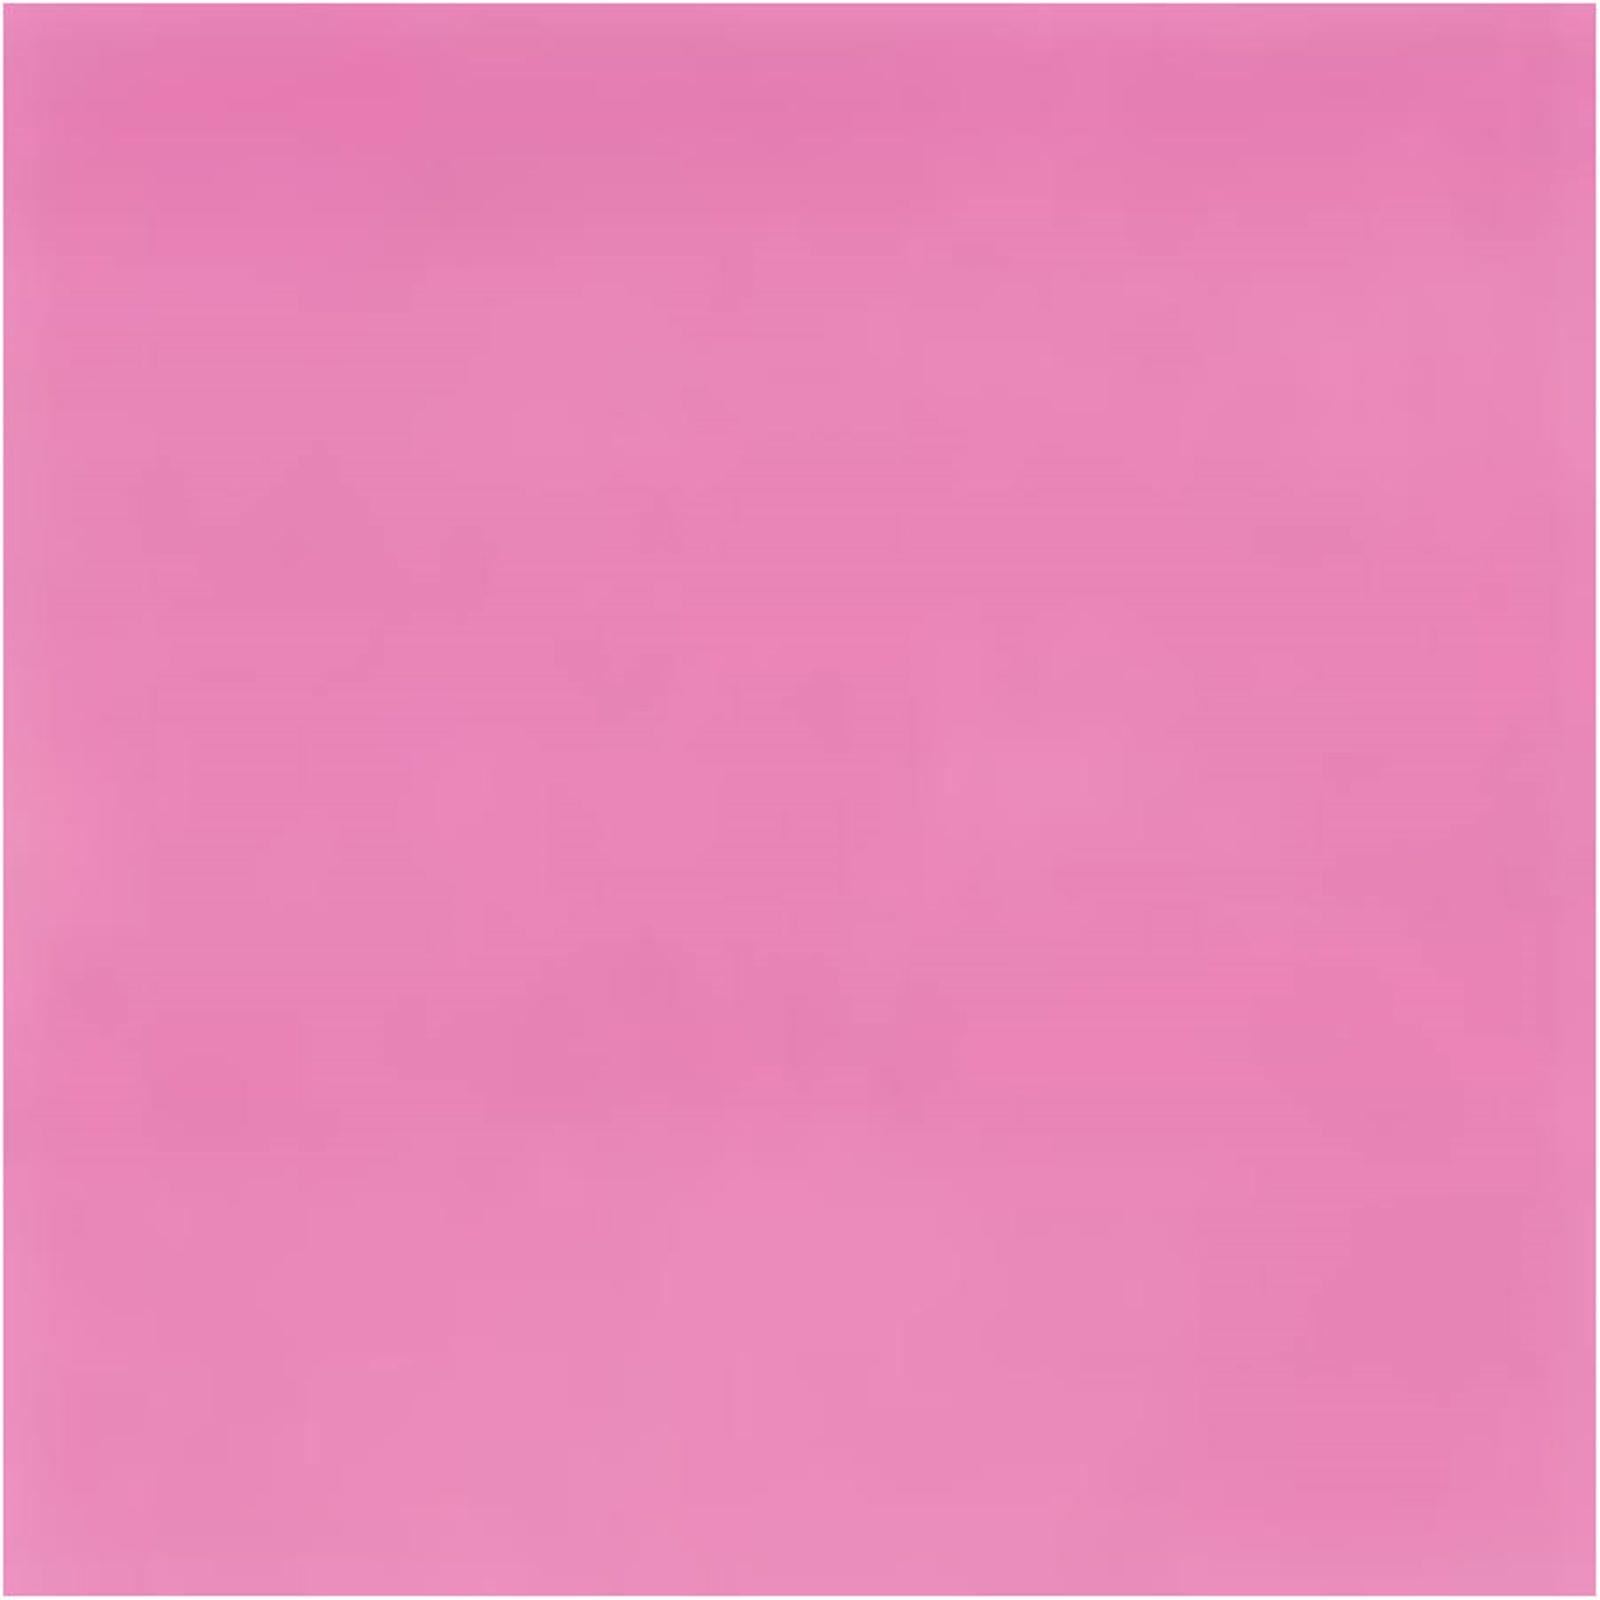 pink fosforescent